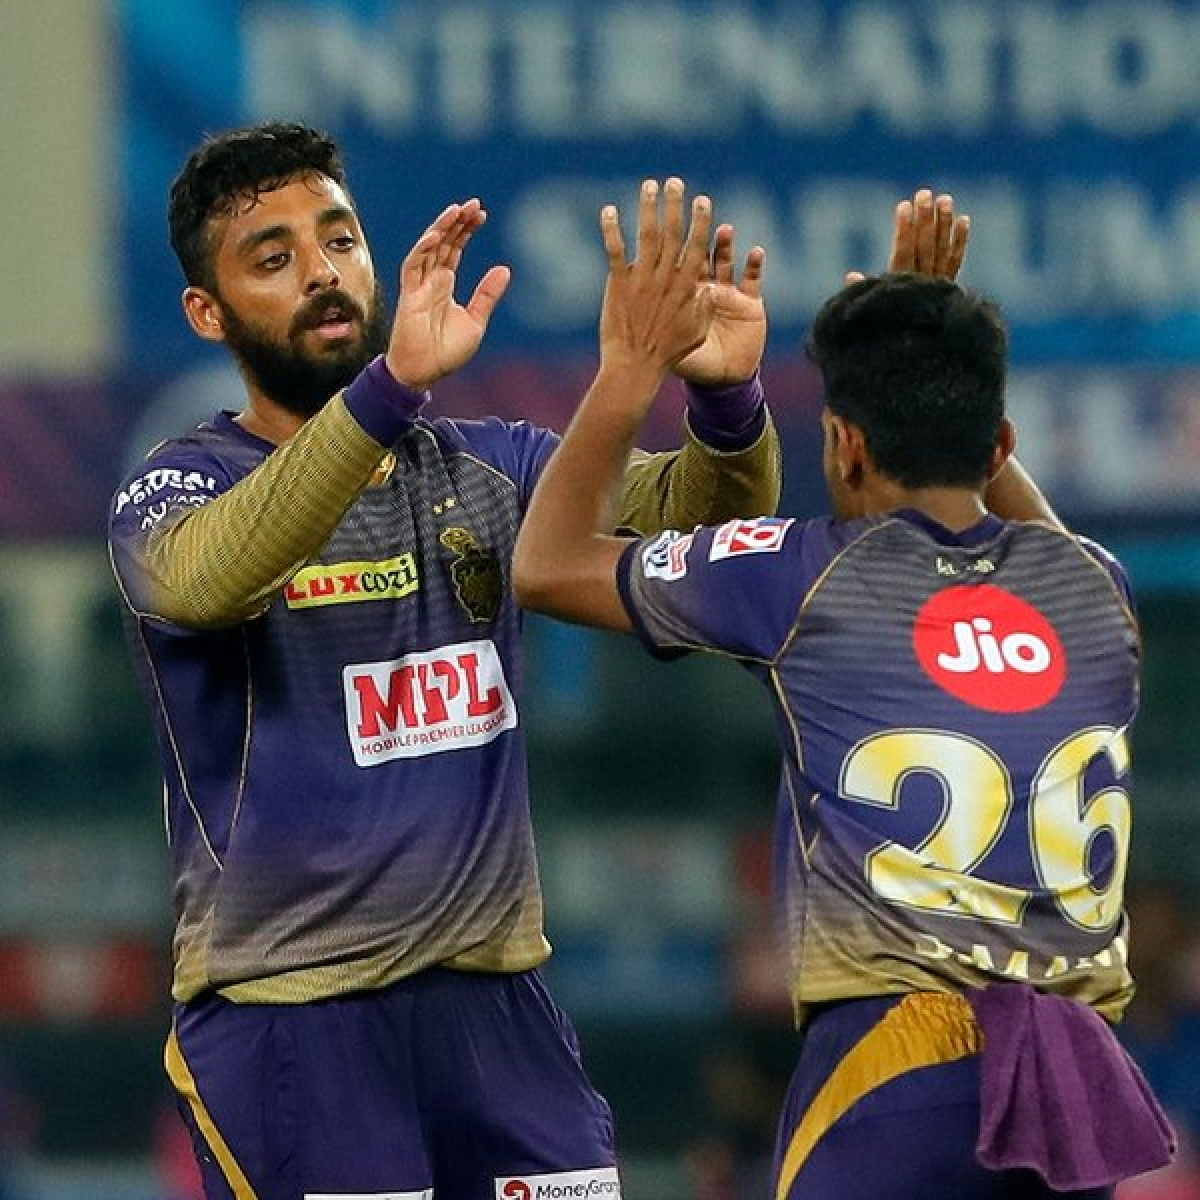 Covid hits IPL: KKR vs RCB match rescheduled after 2 KKR players test positive